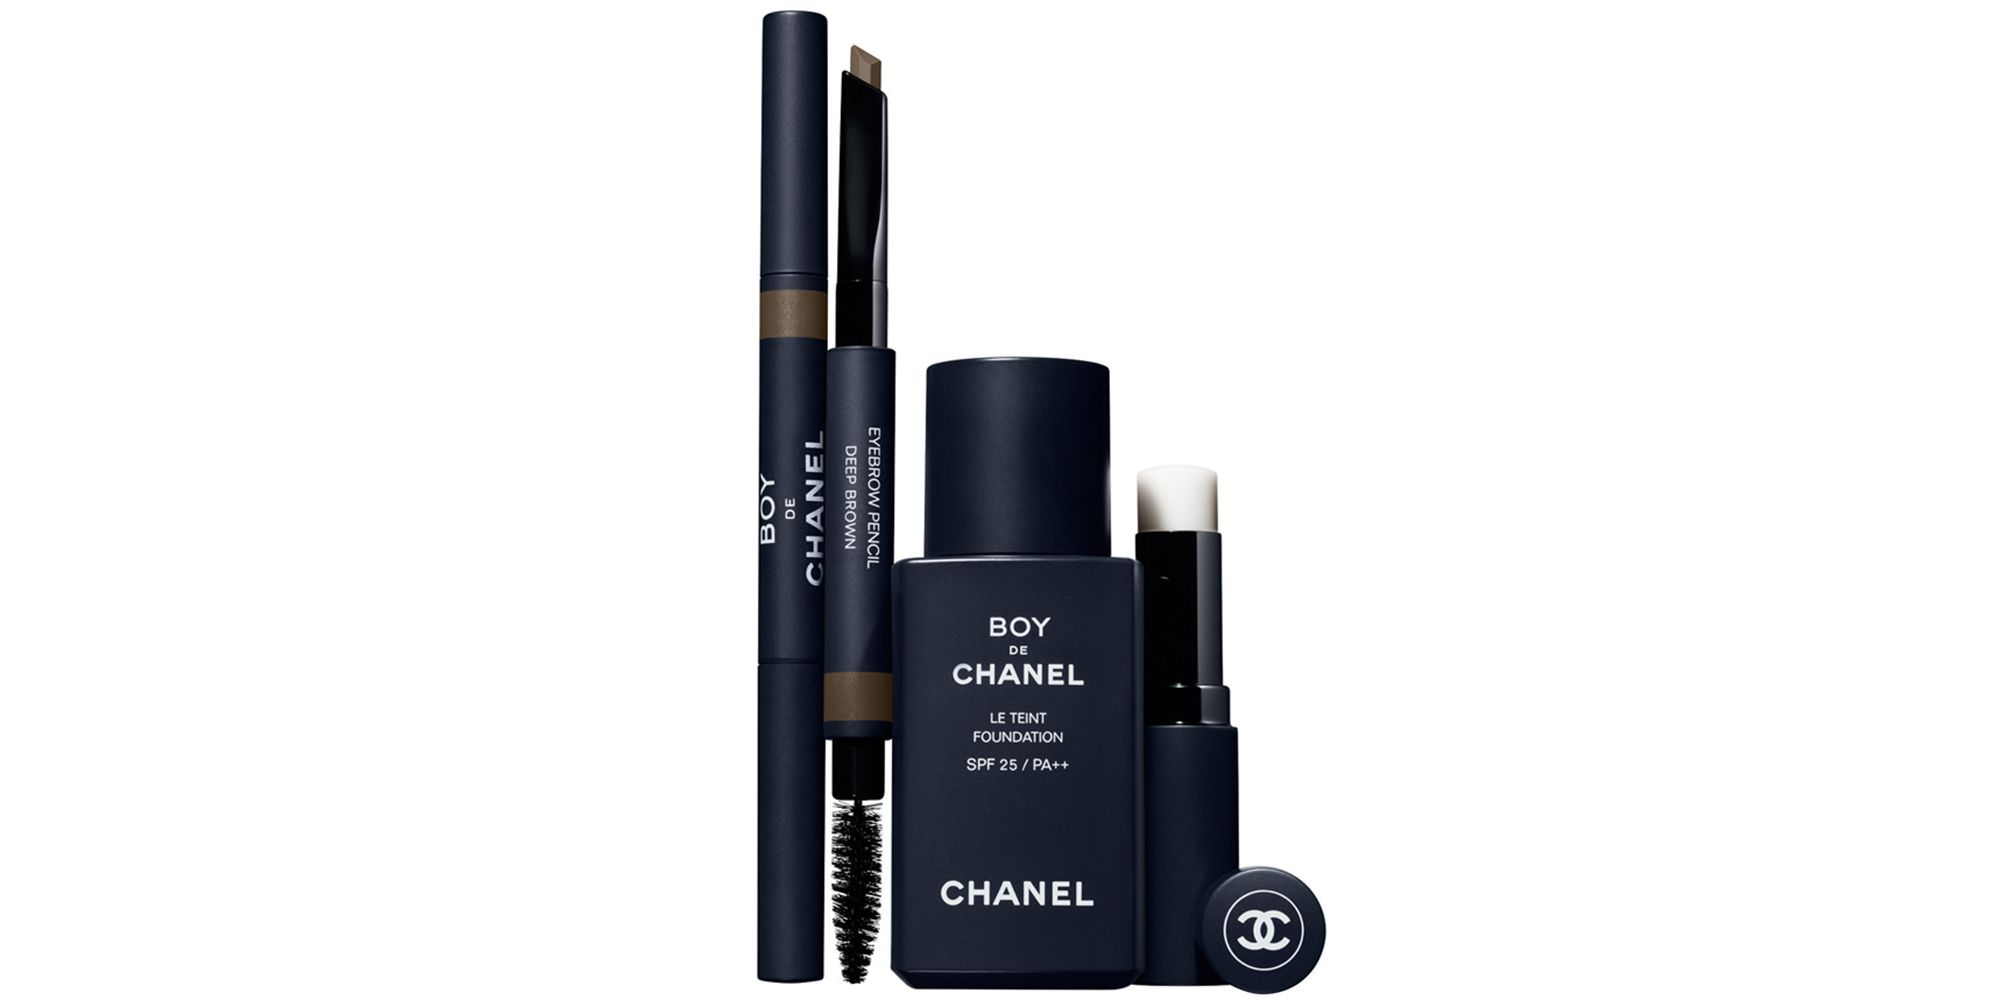 chanel beauty balm